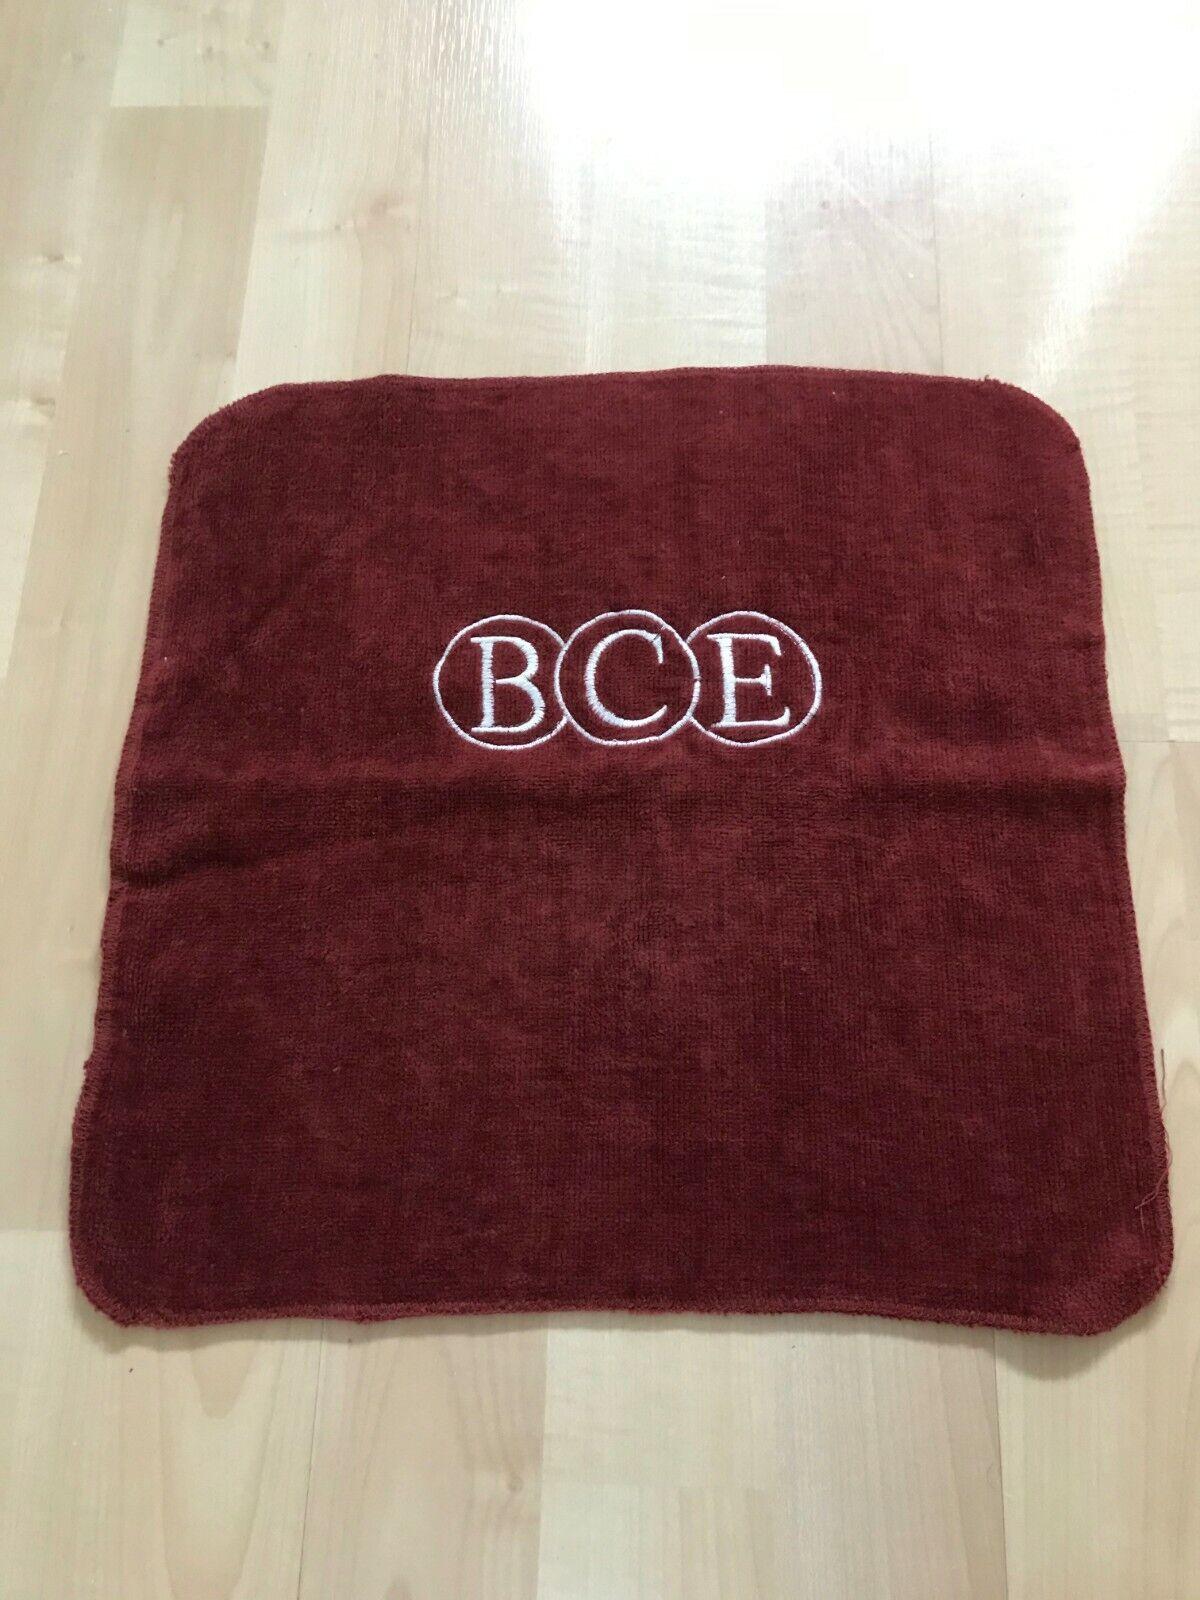 COLLECTORS B-C-E SNOOKER - POOL - BILLIARDS SOUVENIR HAND TOWELLOOK!!!!!!!!!!!